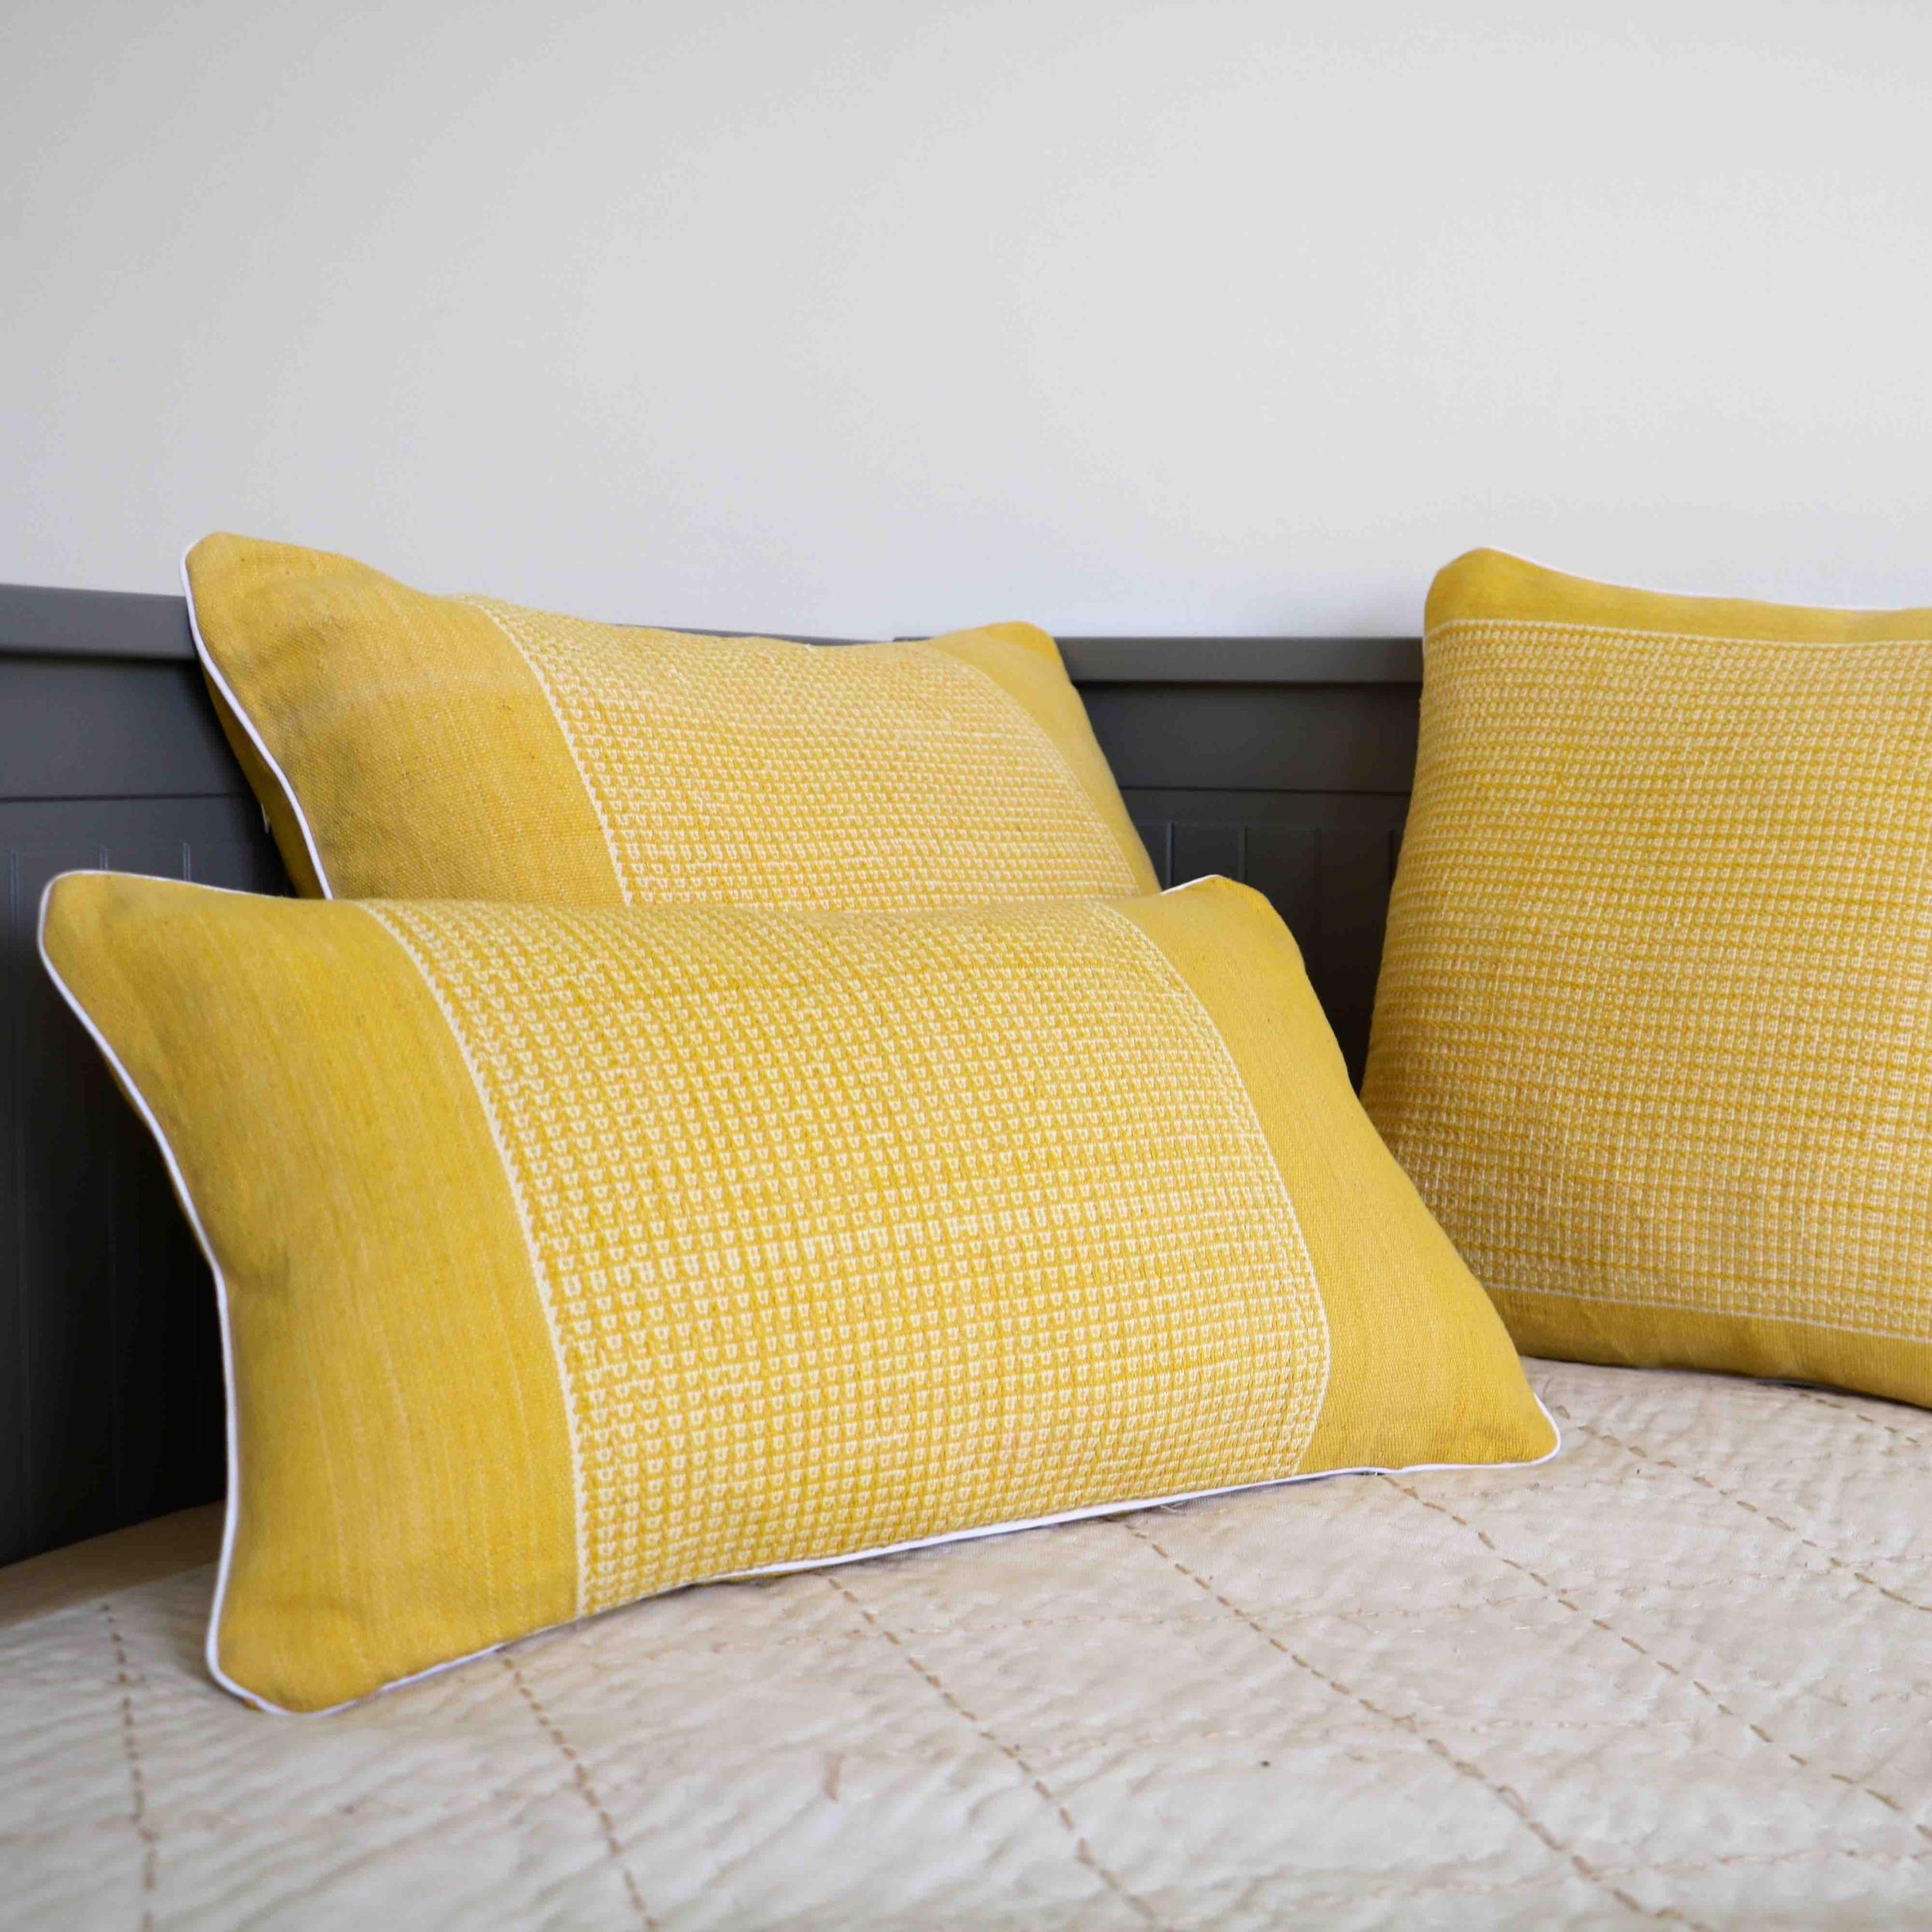 coussin-jaune-trendethics-cils-3-1